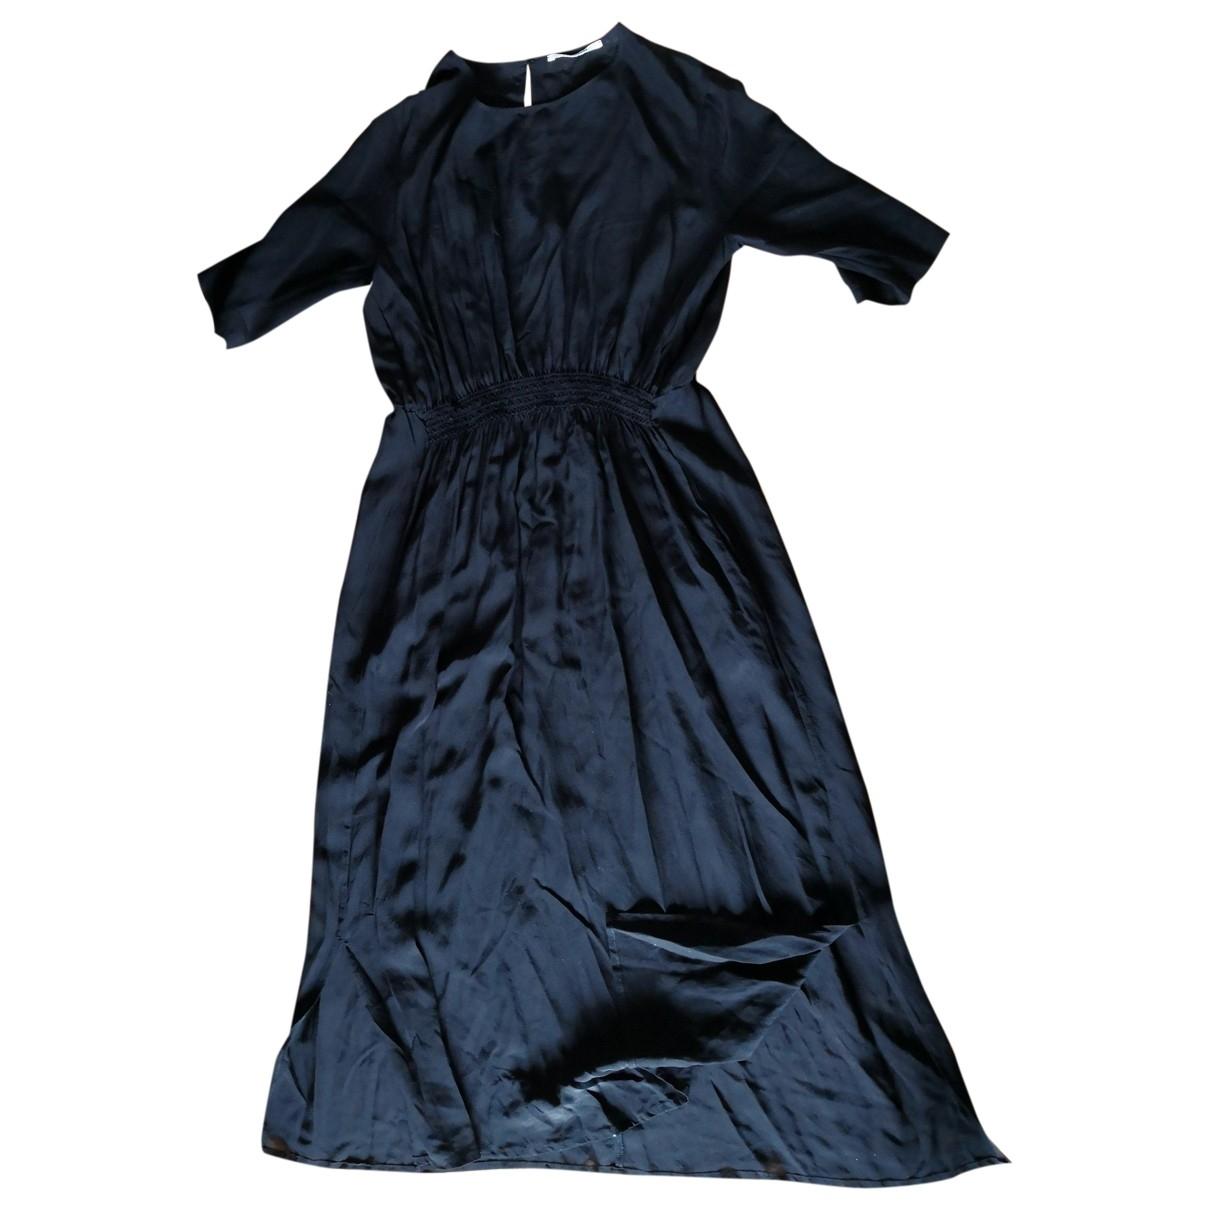 Pomandere \N Kleid in  Schwarz Seide